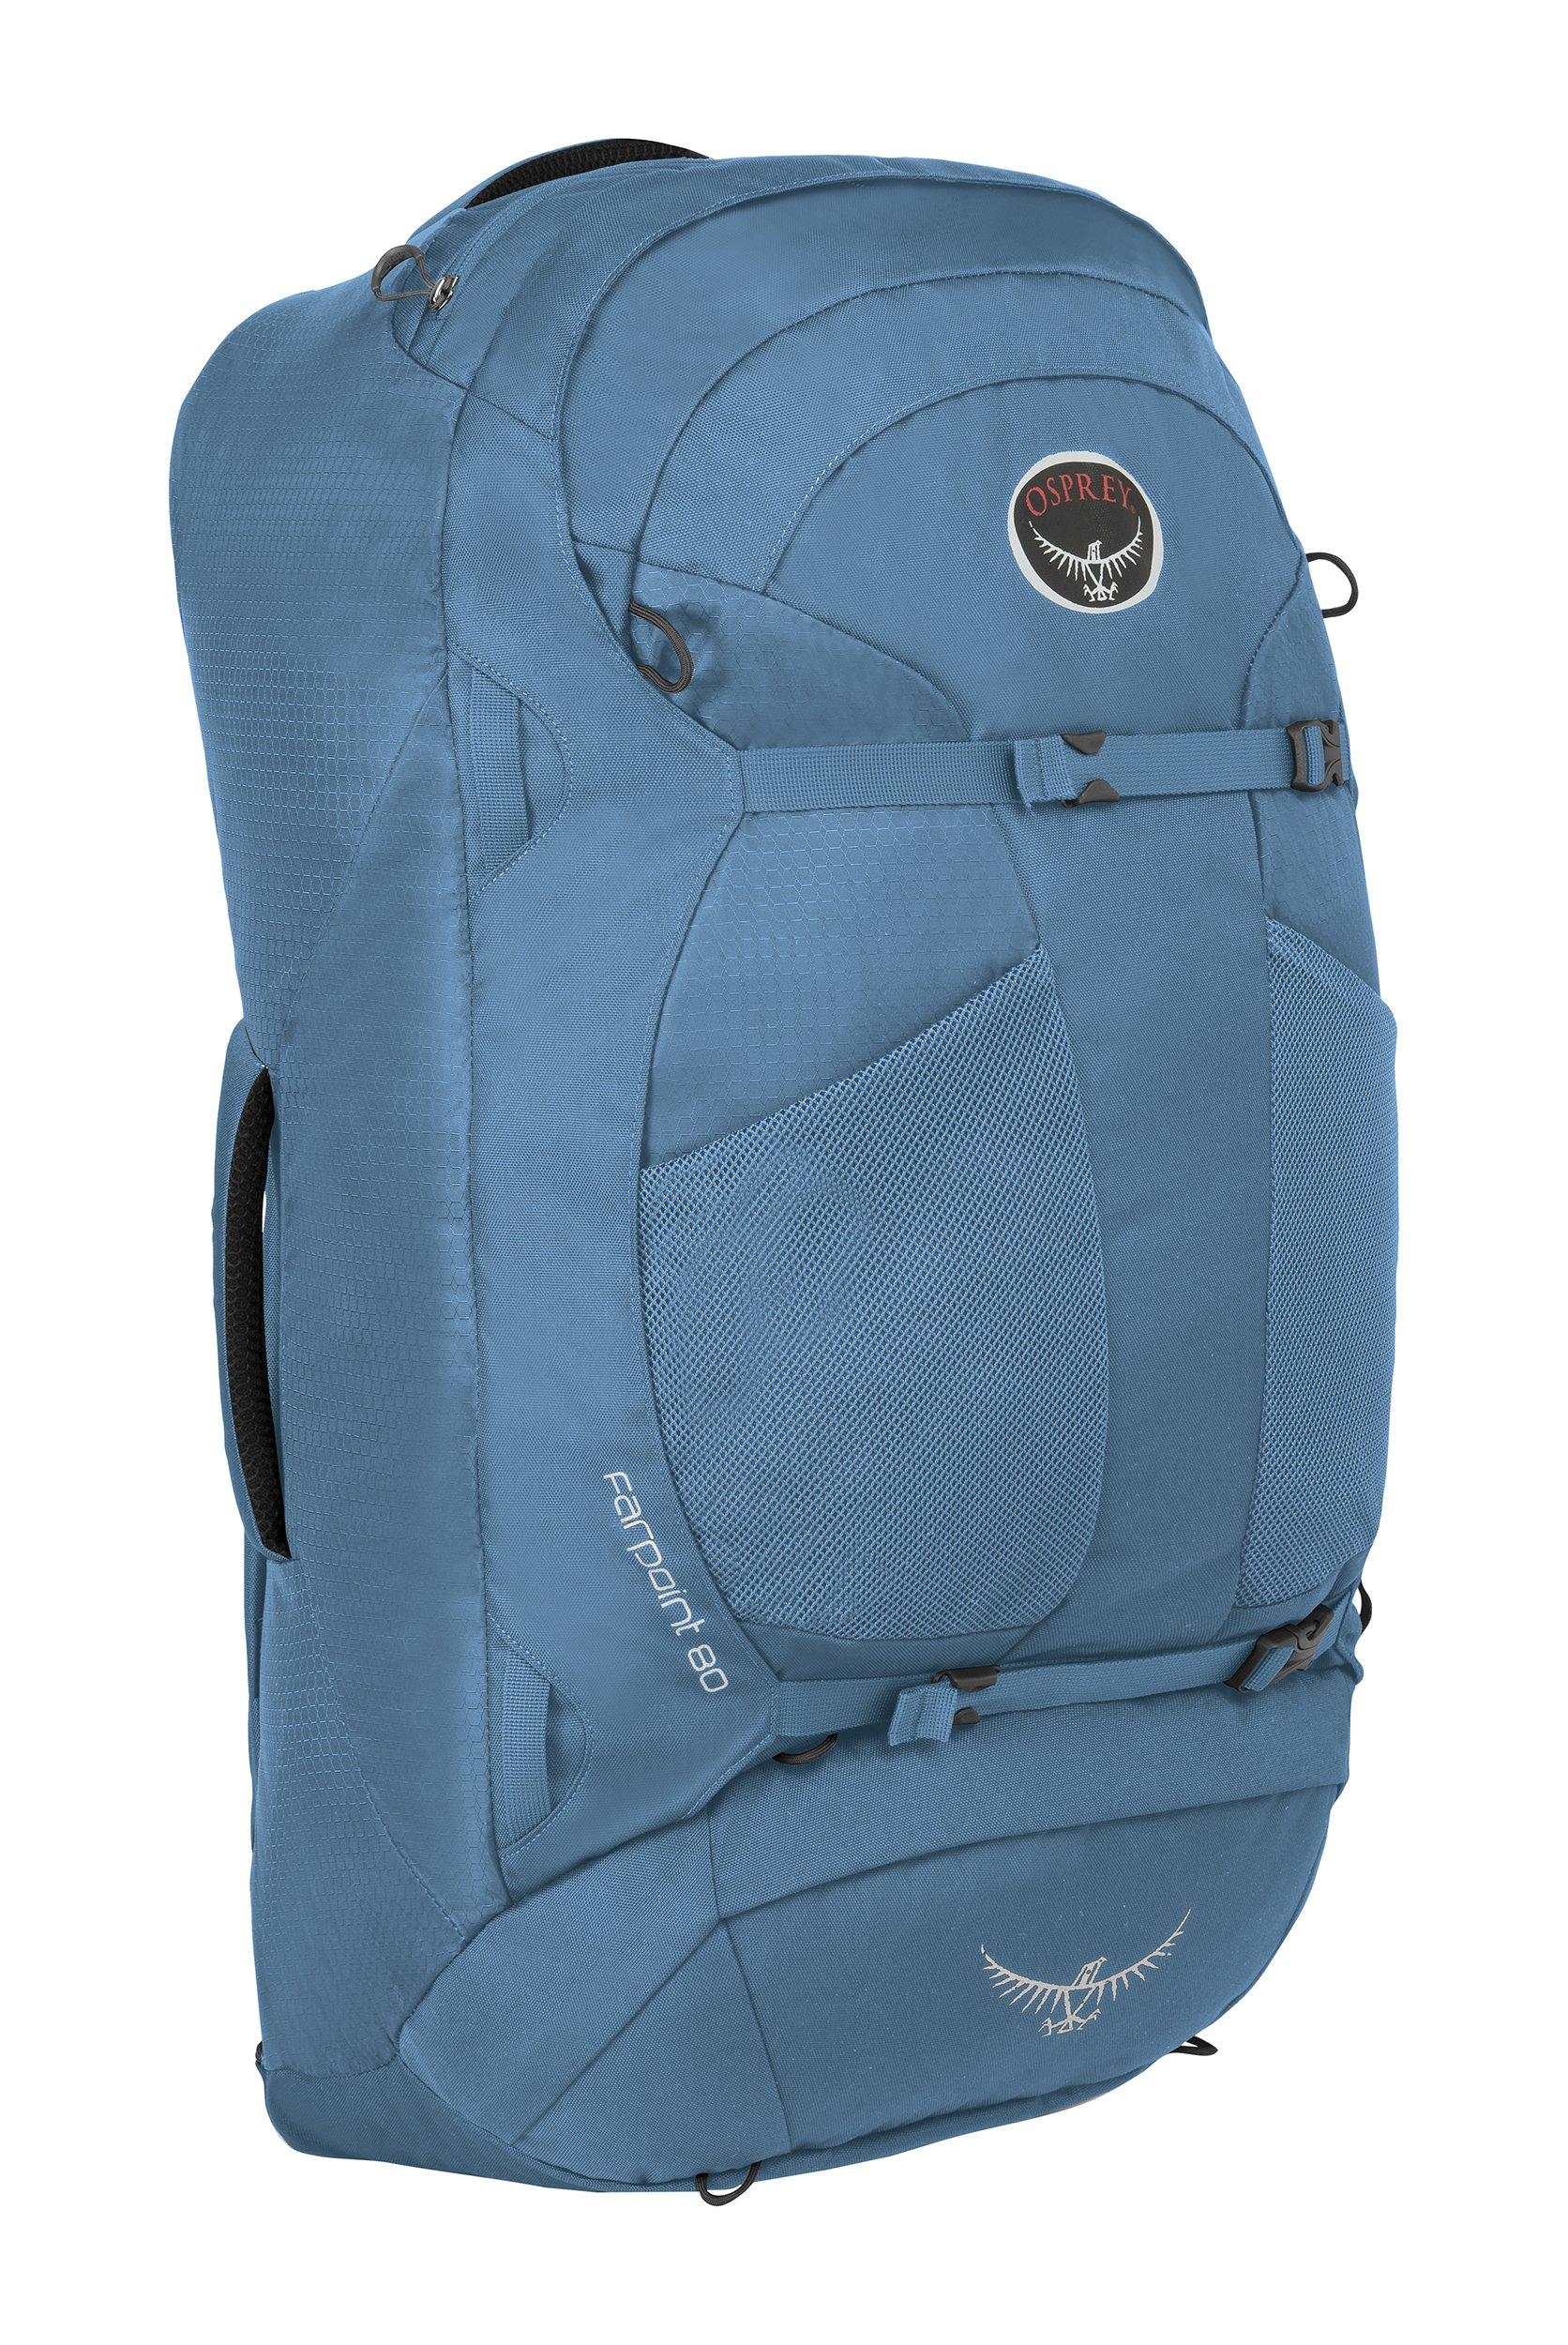 Osprey Packs Farpoint 80 Travel Backpack, Caribbean Blue, Small/Medium by Osprey